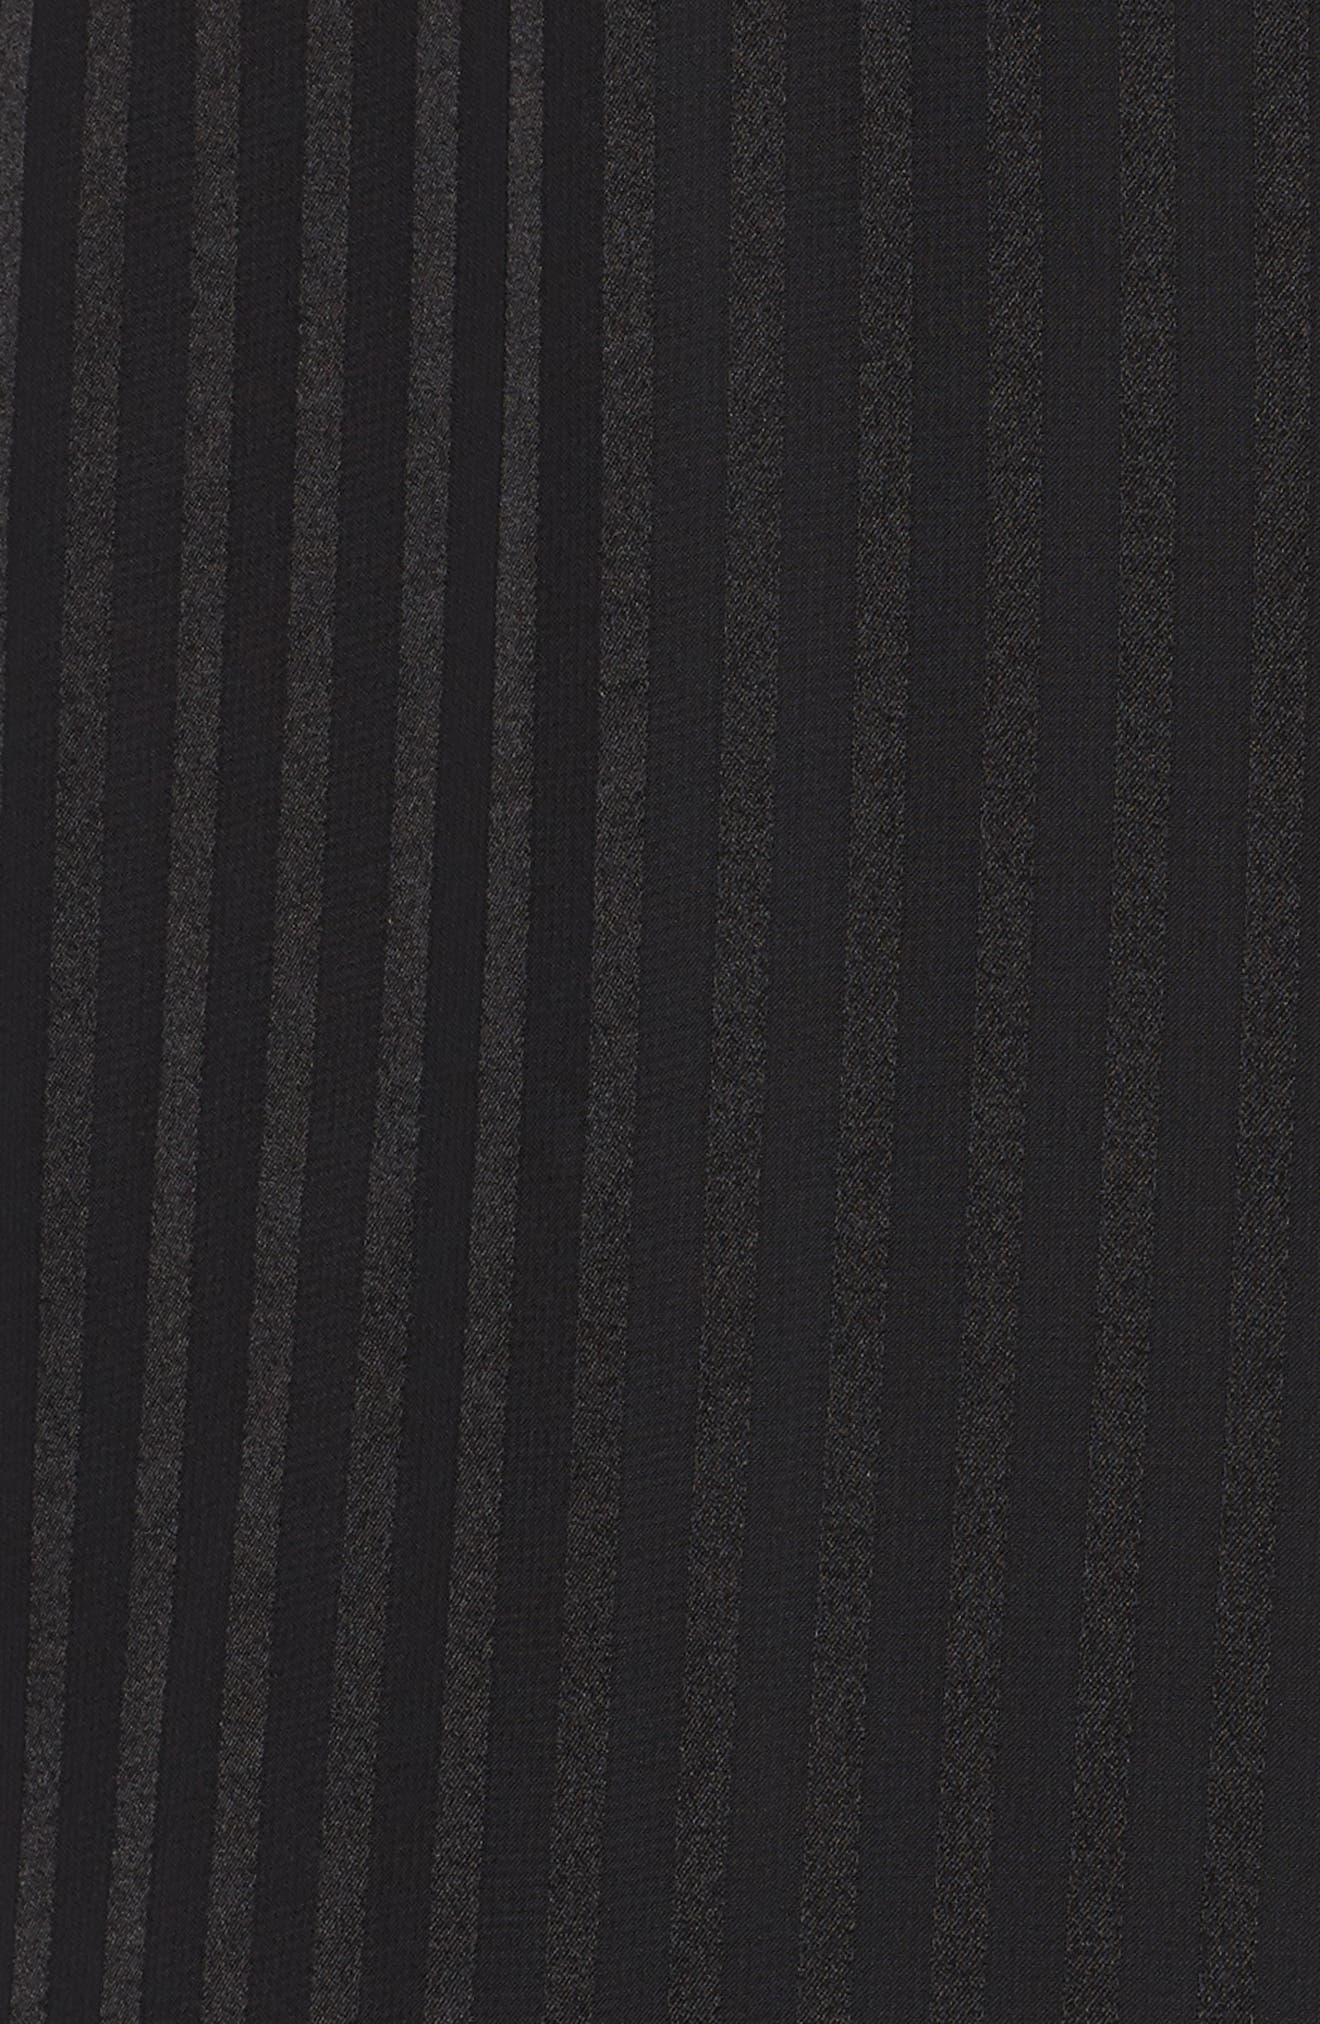 Midnight Cold Shoulder Wrap Dress,                             Alternate thumbnail 5, color,                             001